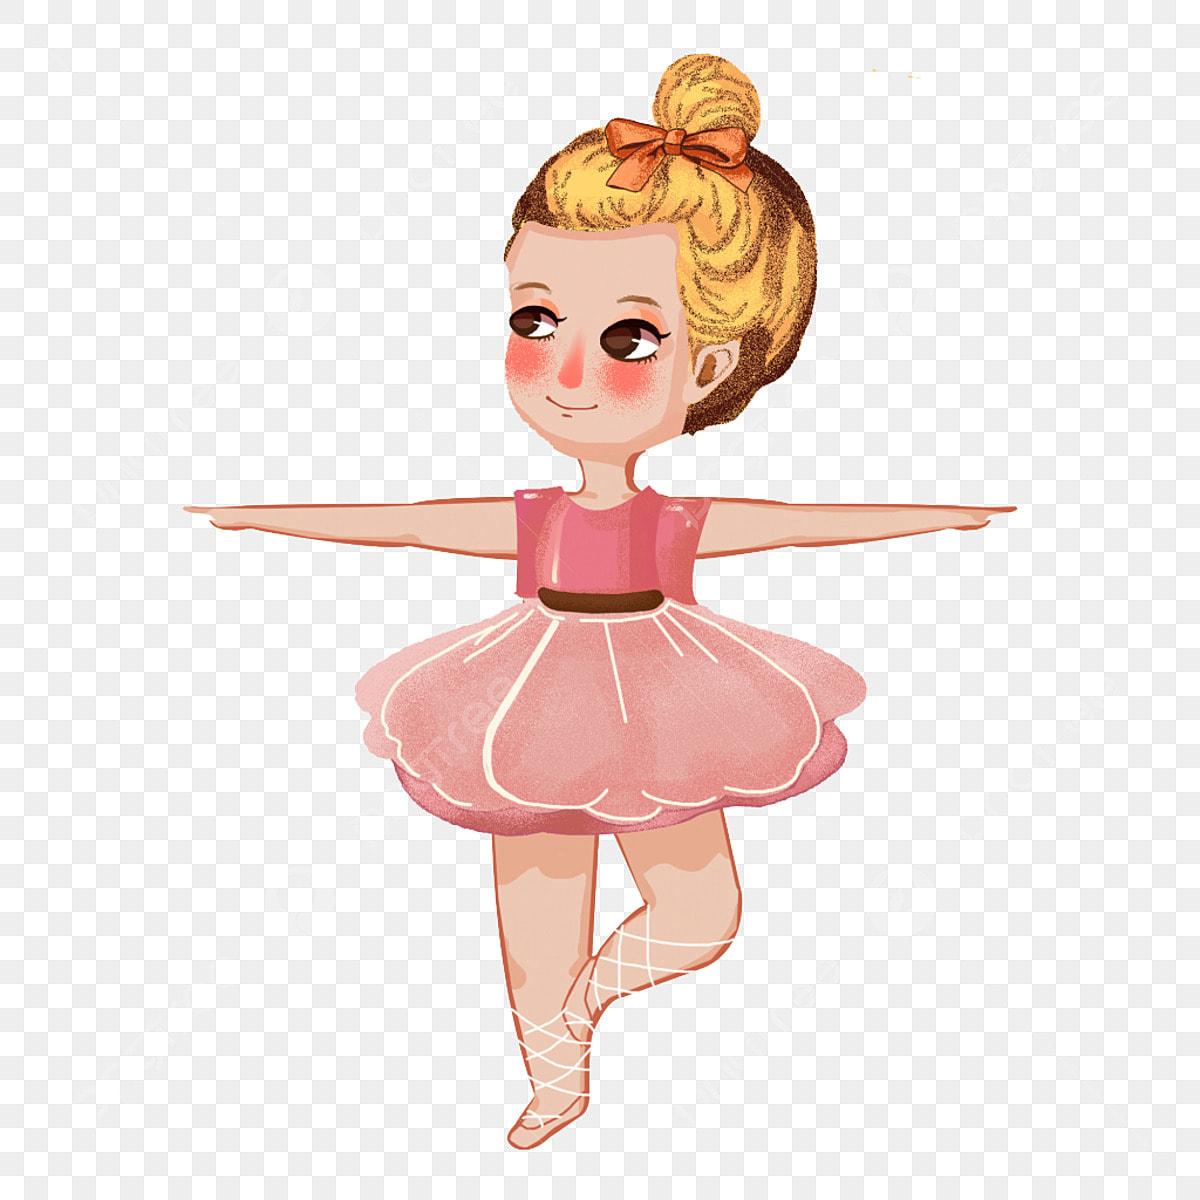 Ballet clipart cartoon, Ballet cartoon Transparent FREE for download on  WebStockReview 2020